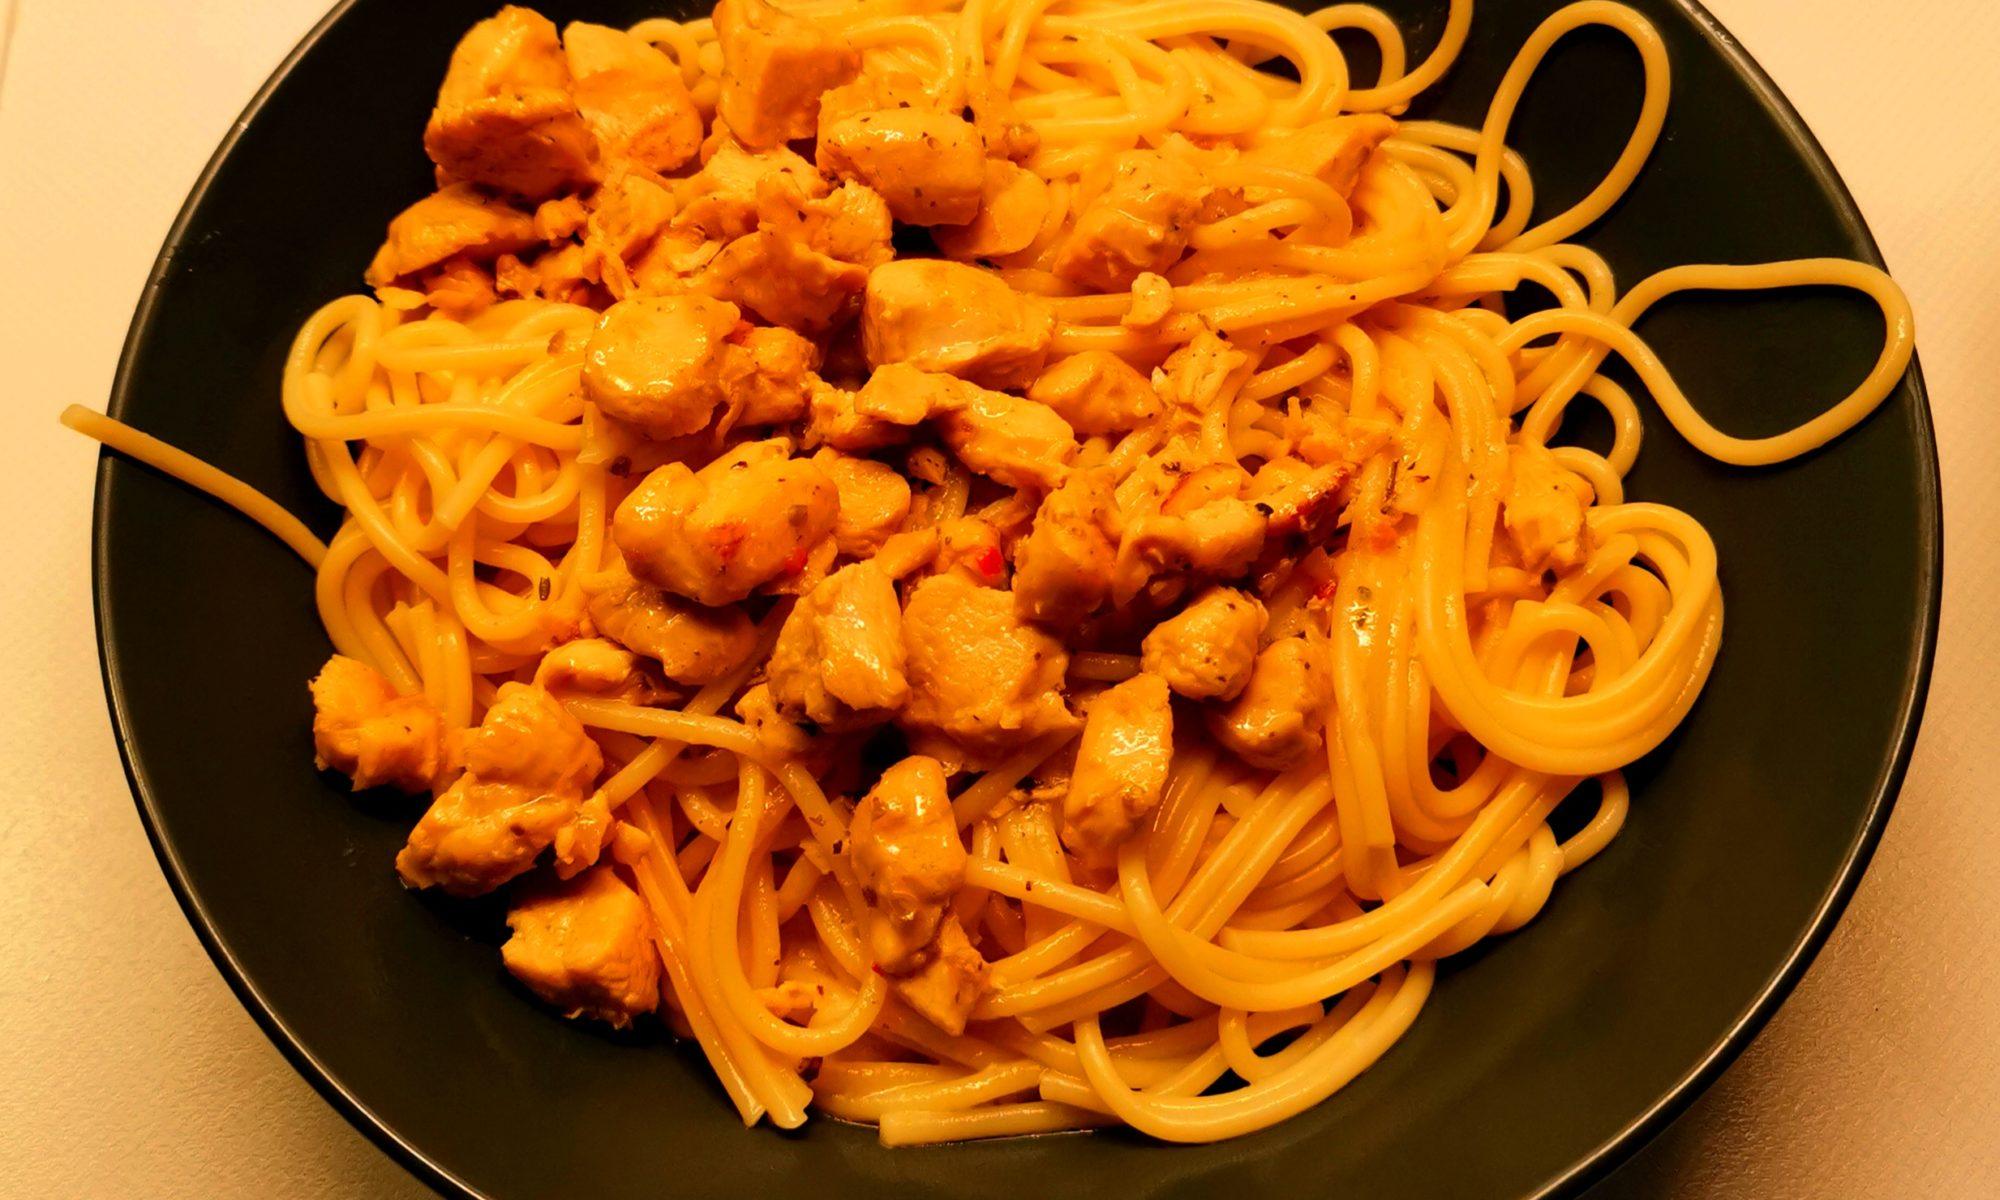 Spaghettoni in Hühnchen-Pernod-Soße